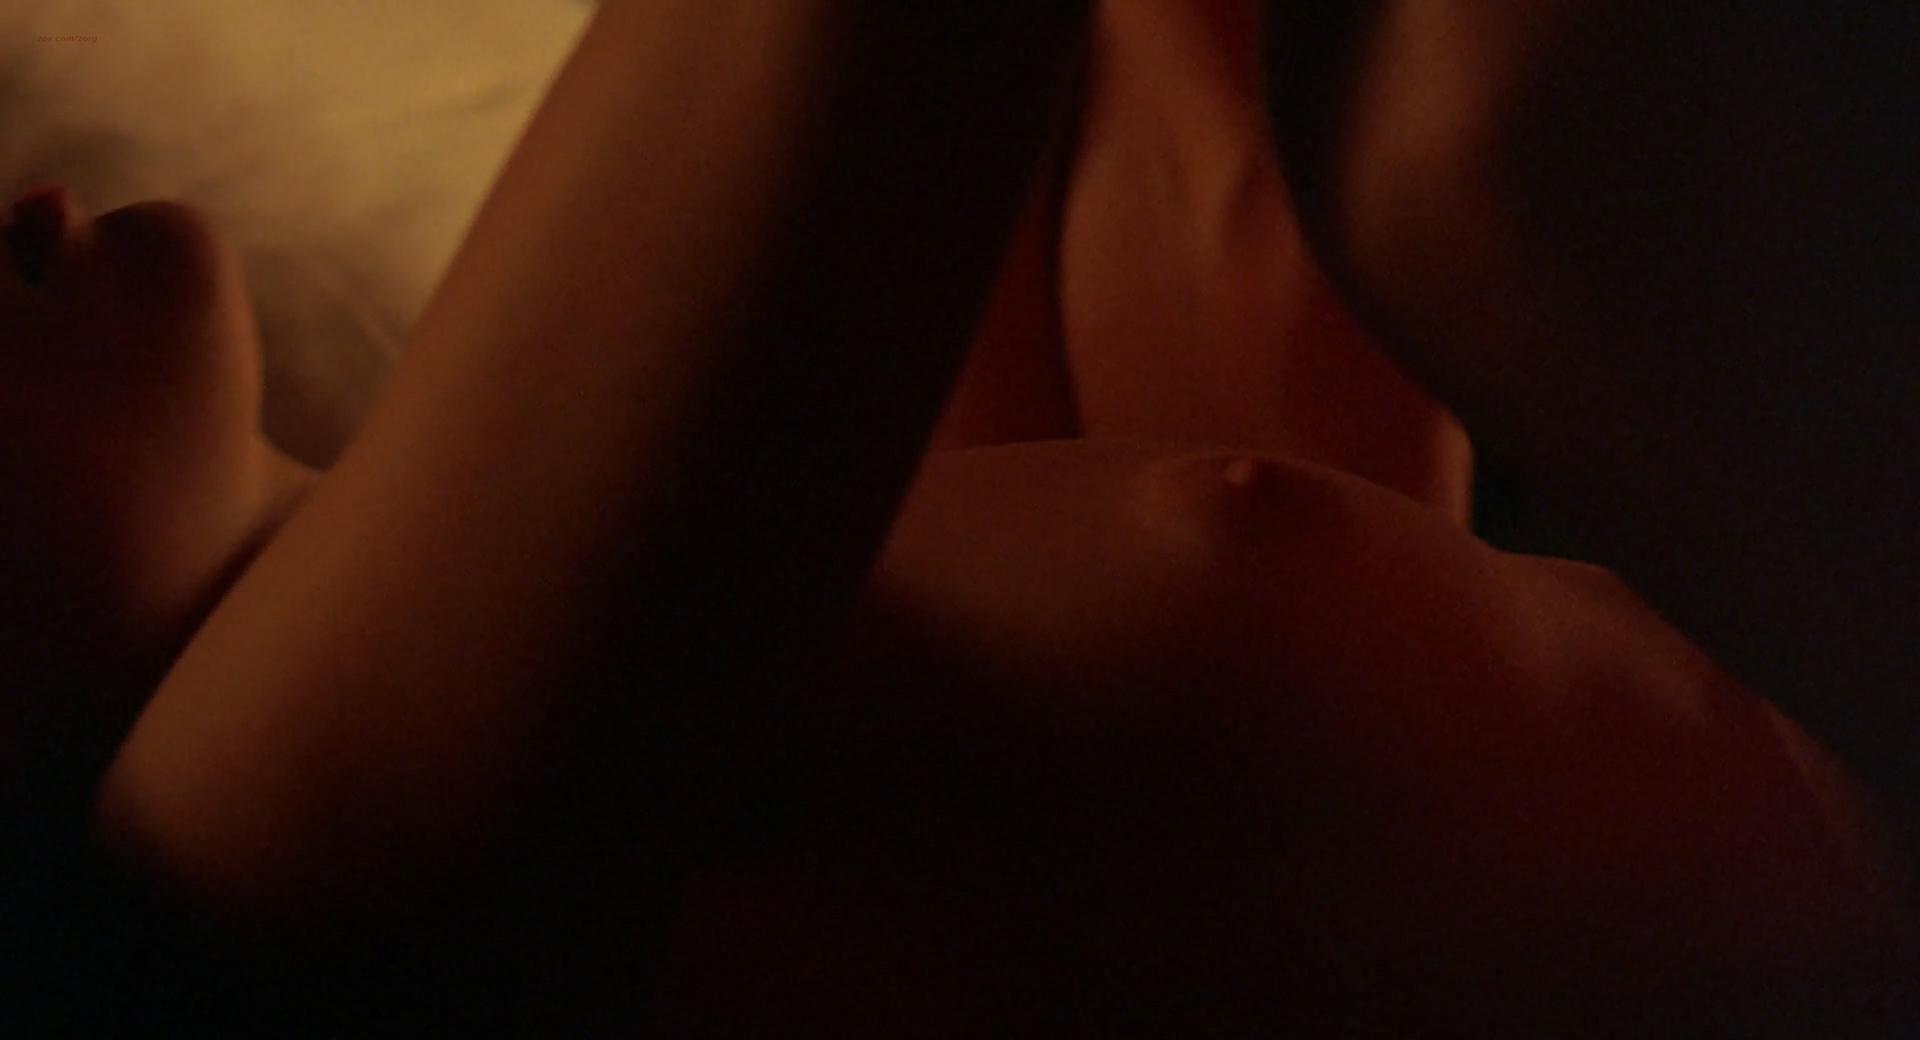 Fanny ardant nude right!